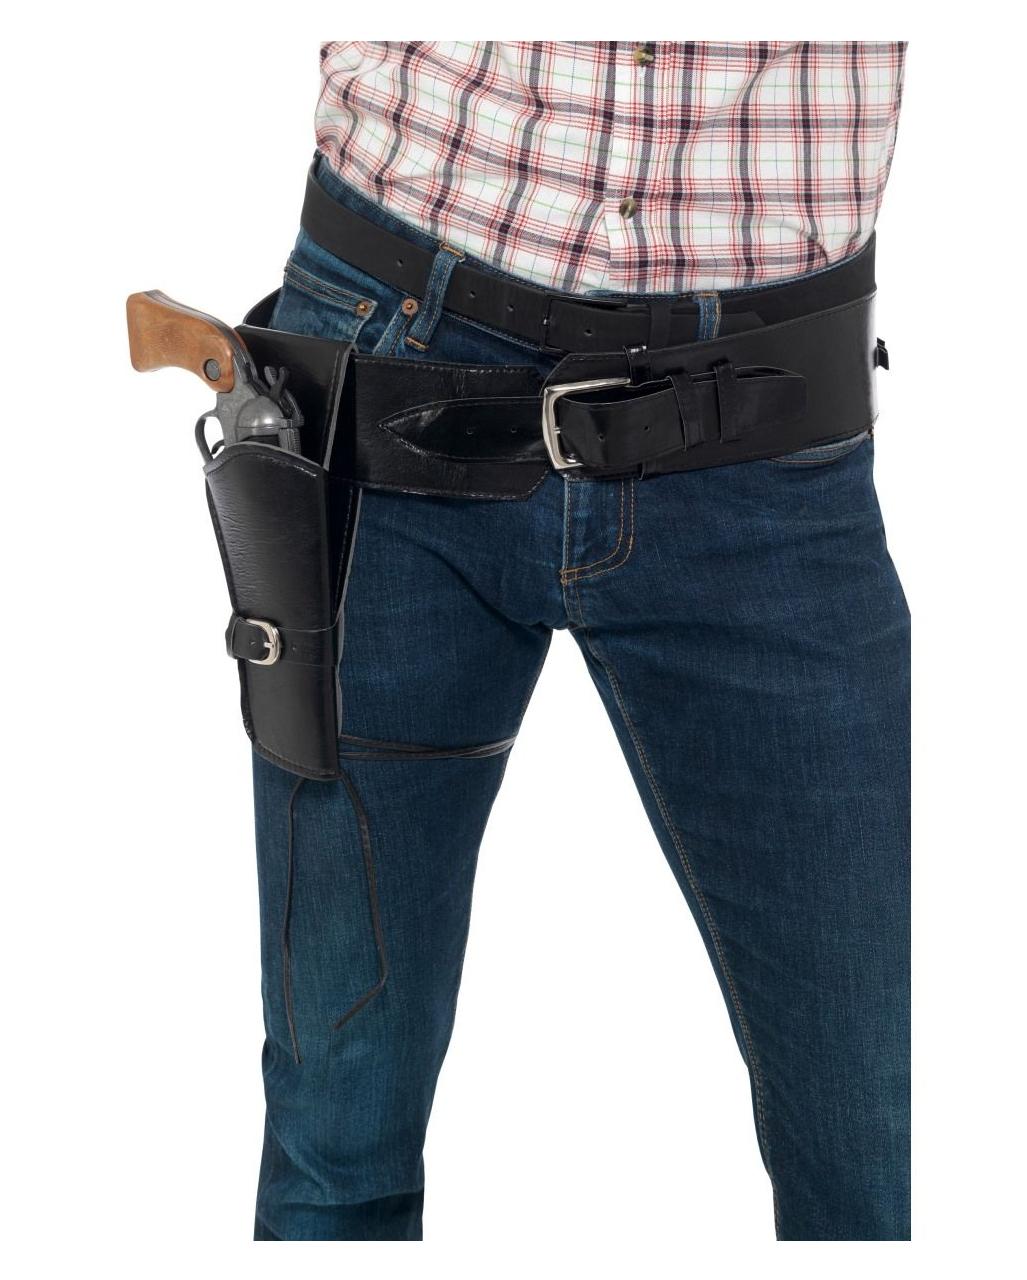 Best crossdraw holsters